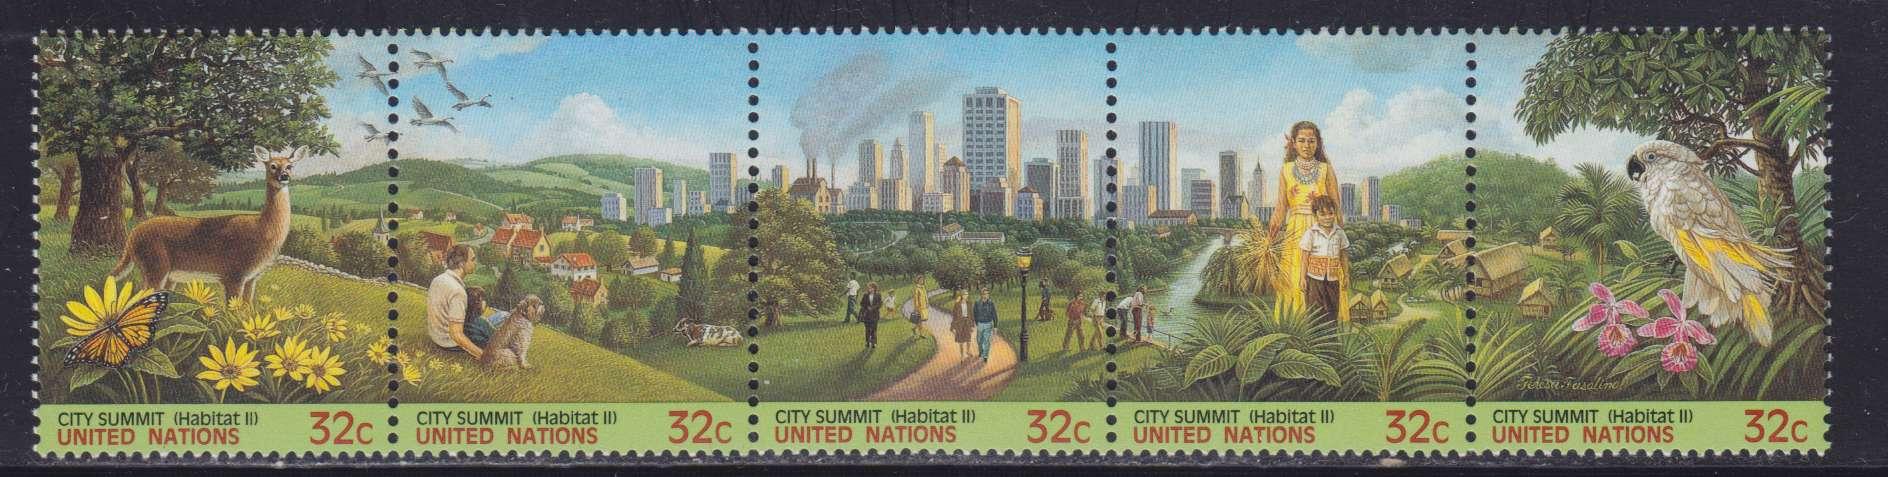 native city